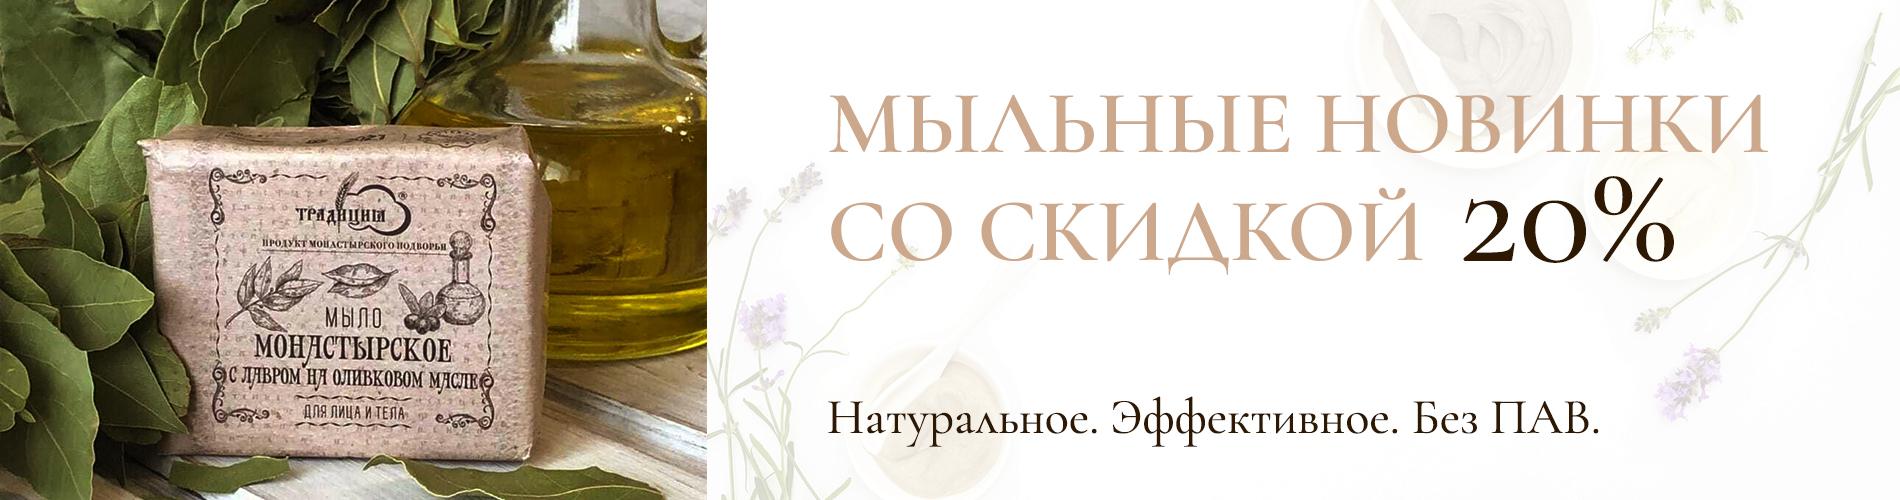 spring-banner-2